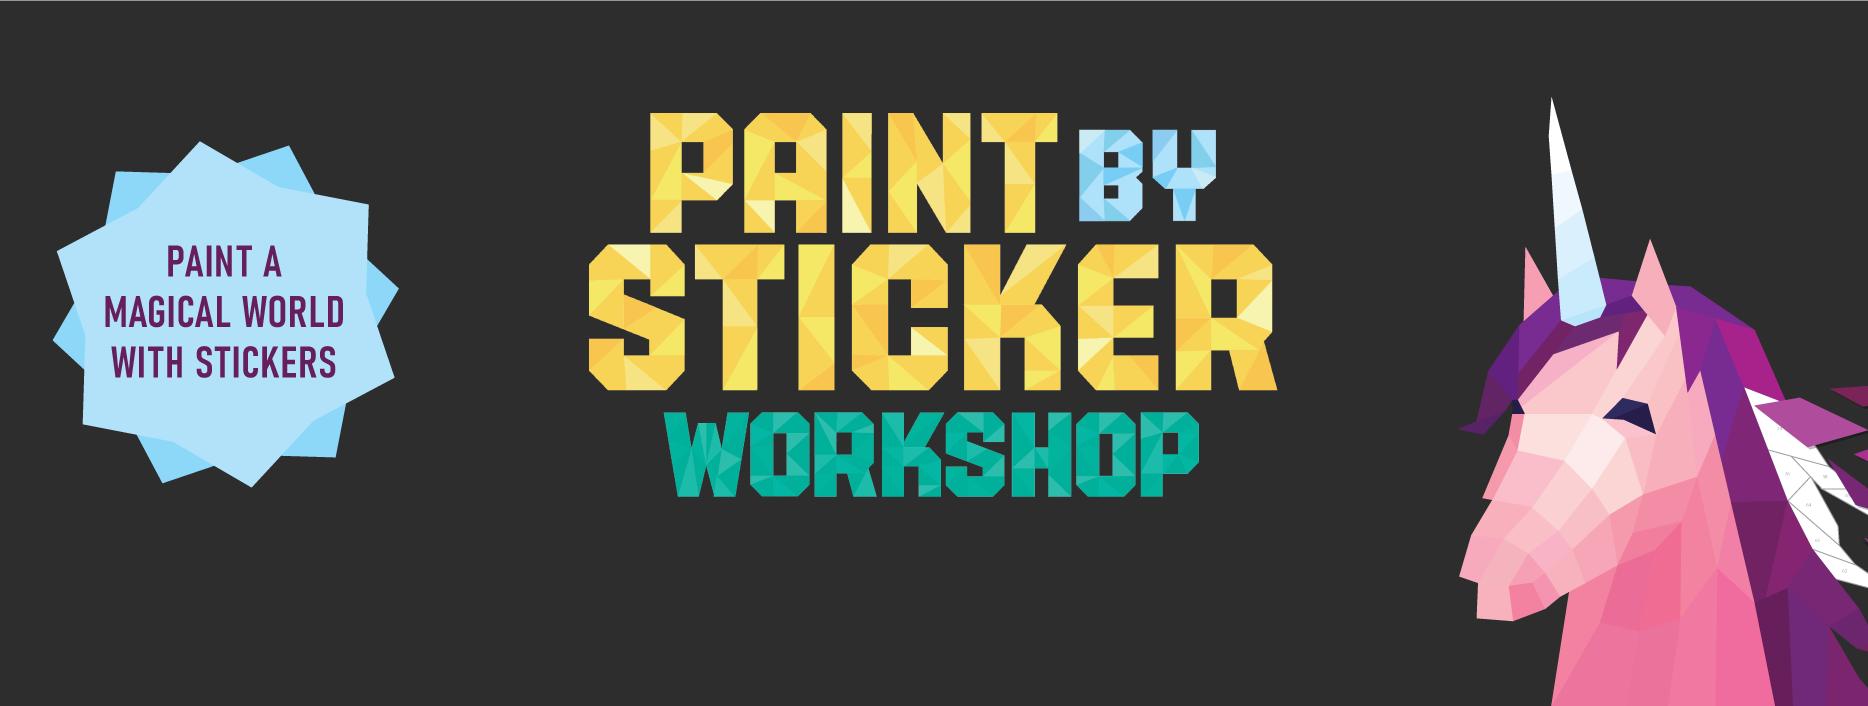 Paint by Sticker Workshop